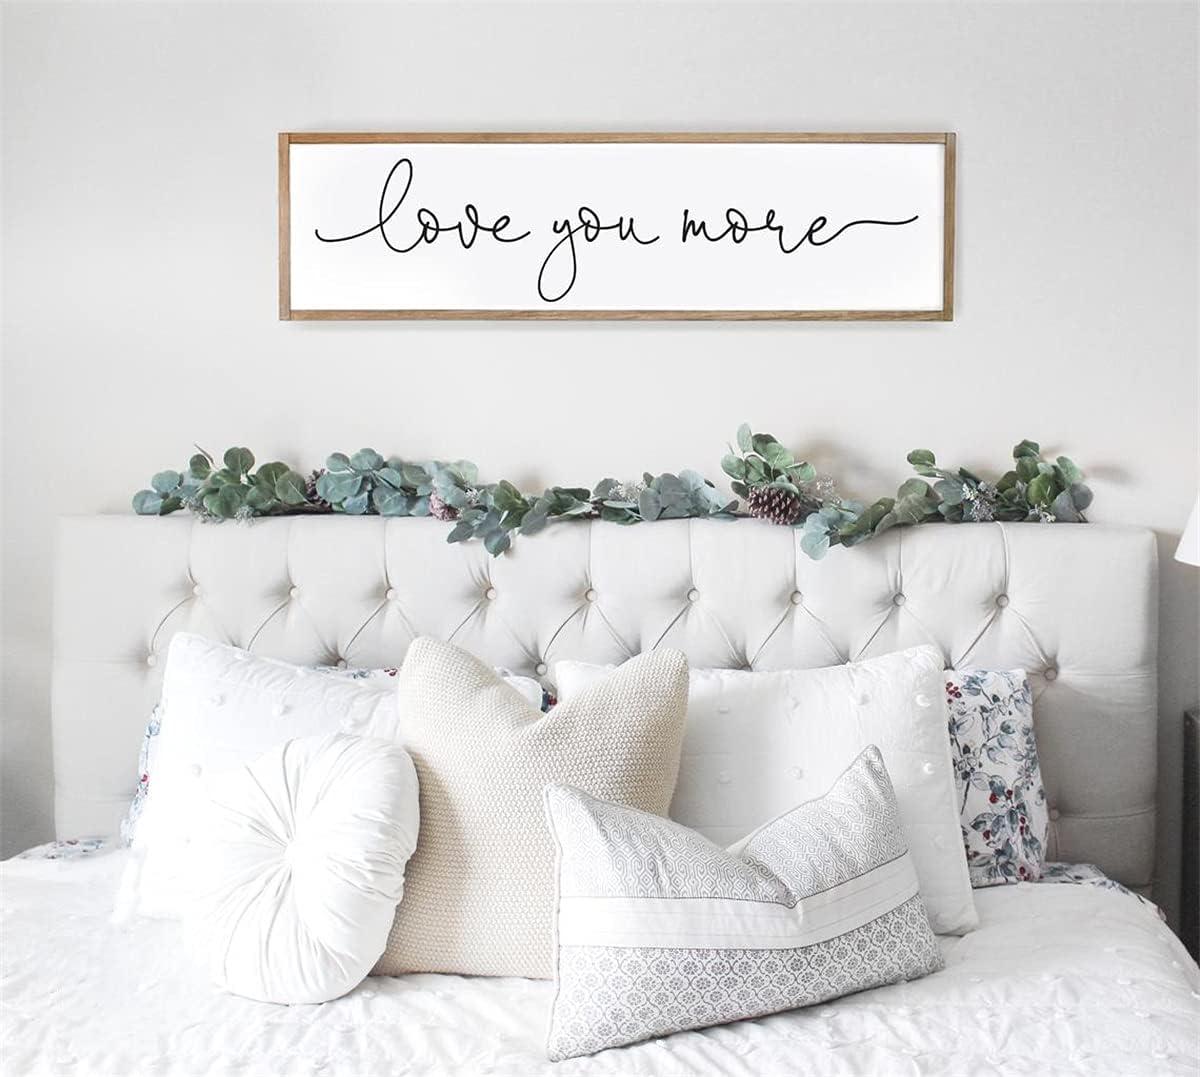 SALENEW very popular Super popular specialty store Bedroom Wall Decor Love You De Art More Master